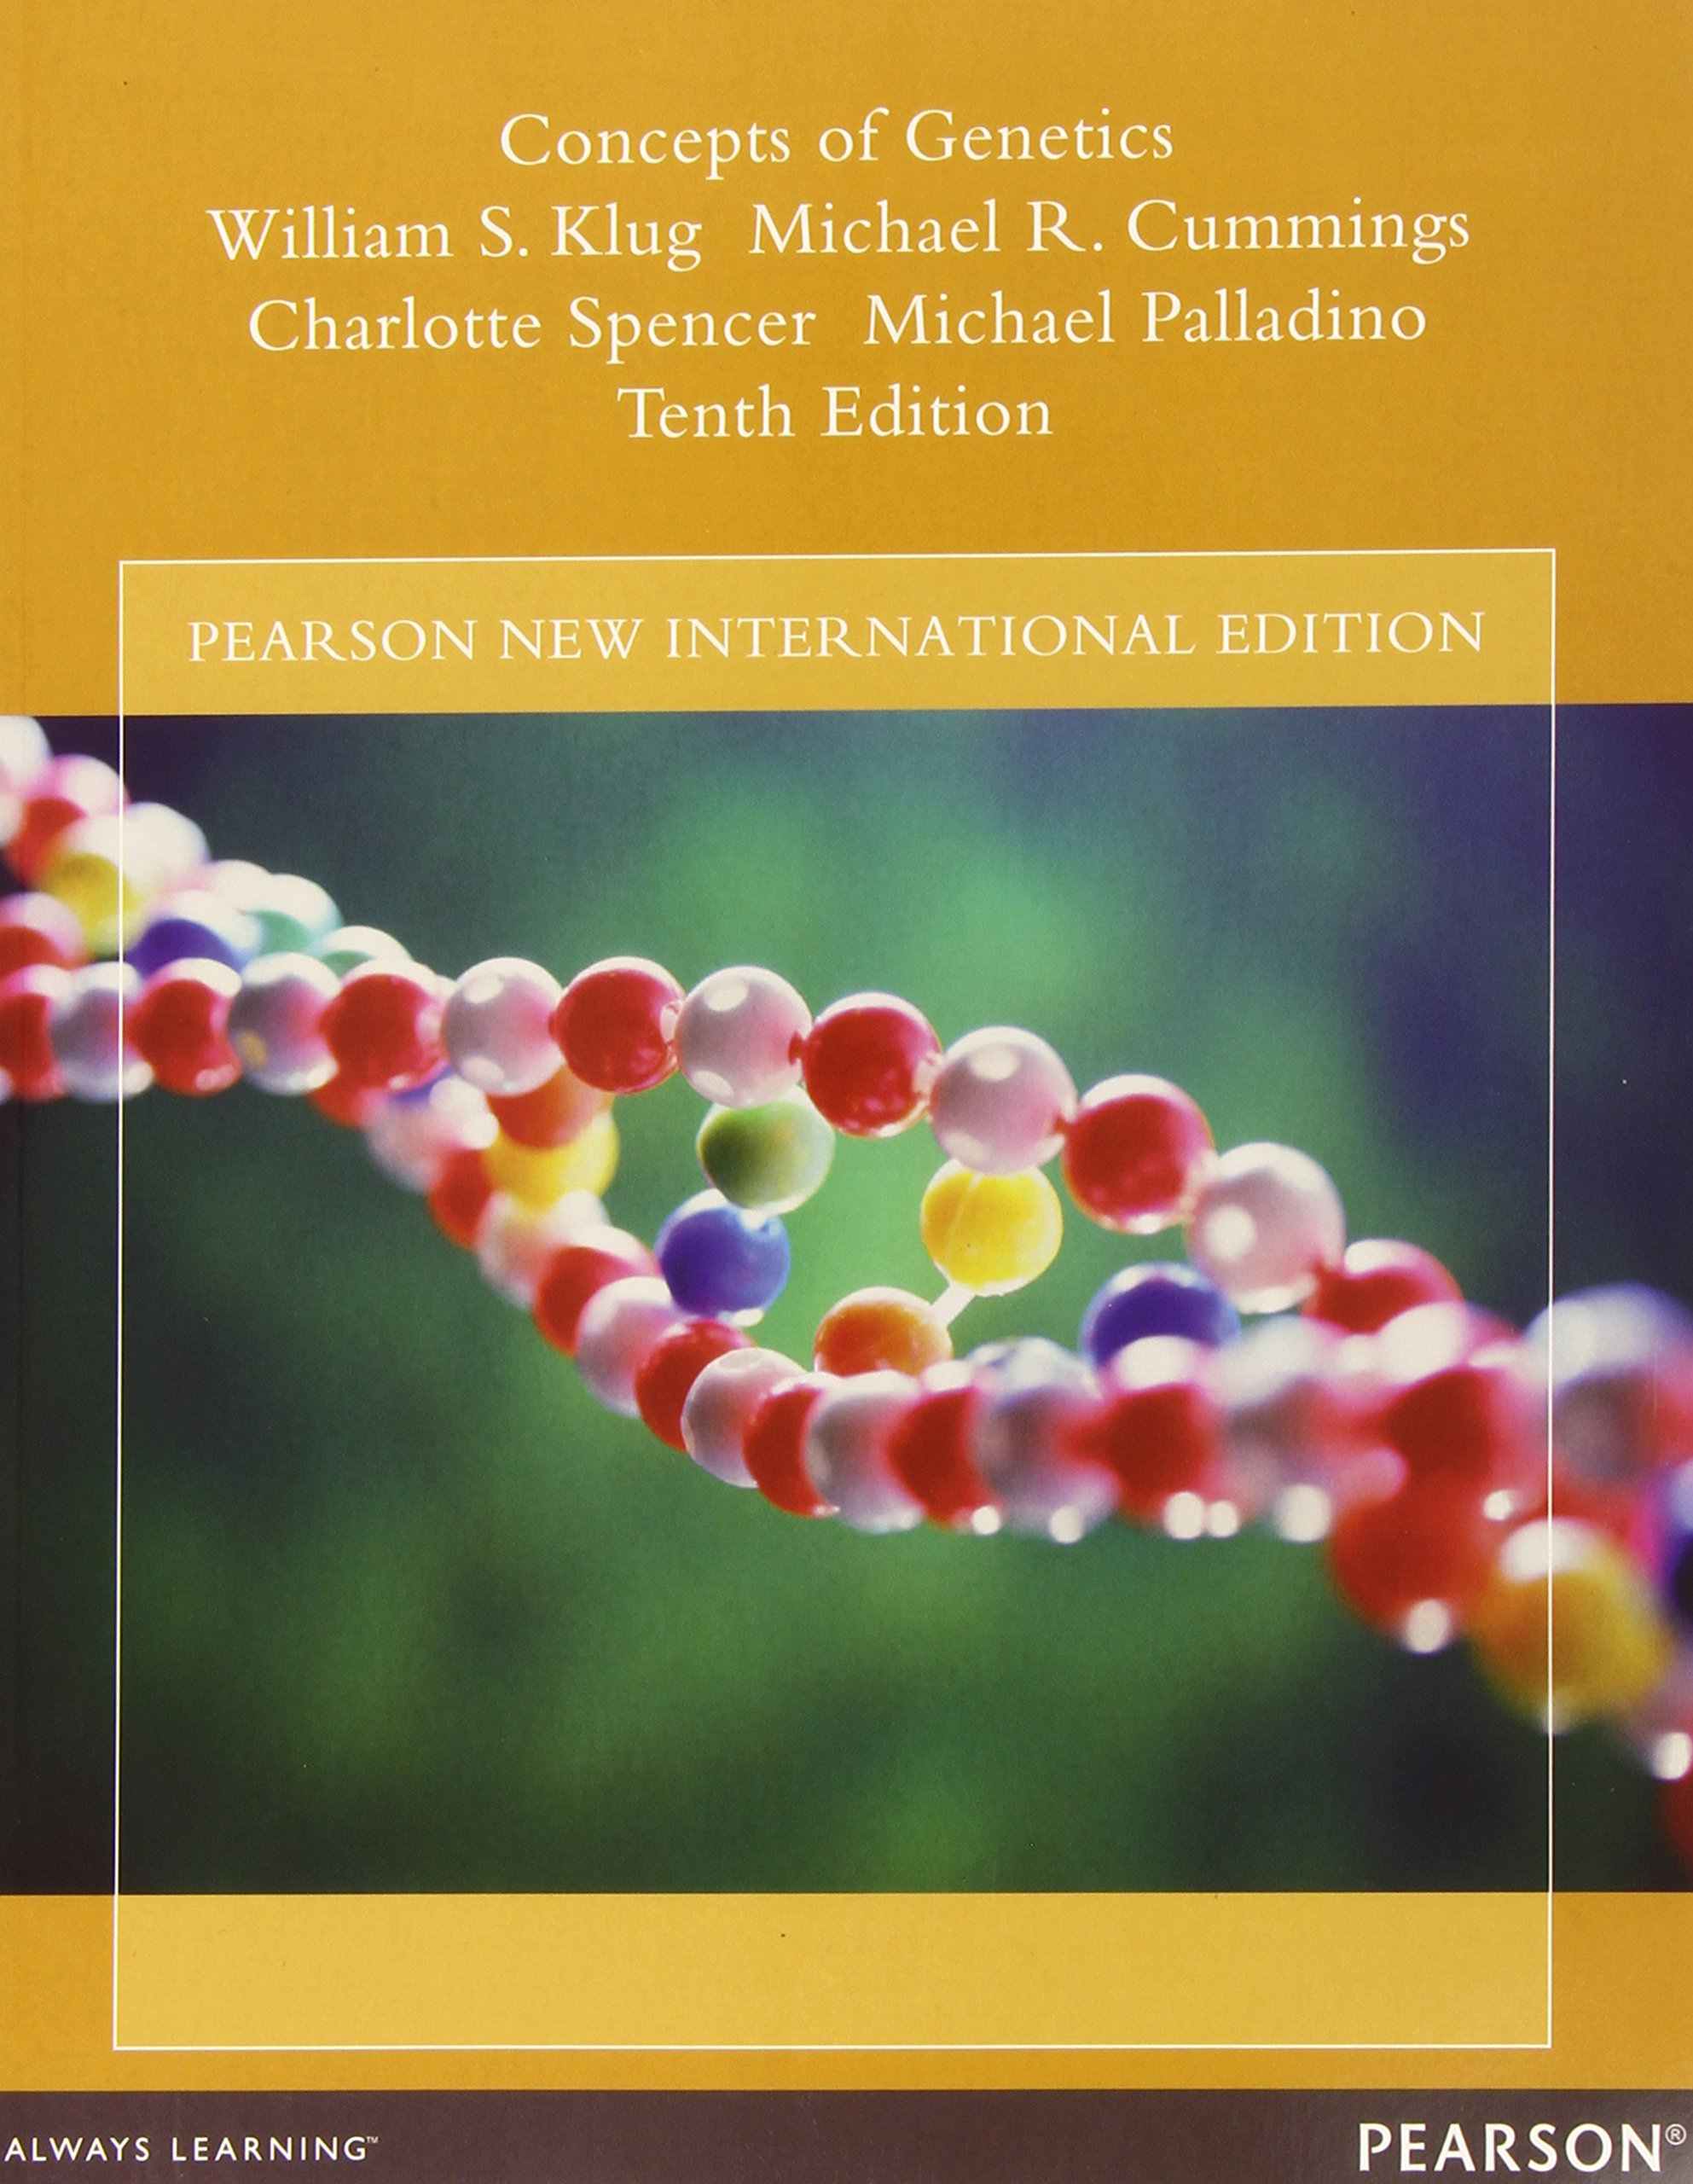 Concepts of Genetics: Pearson New International Edition